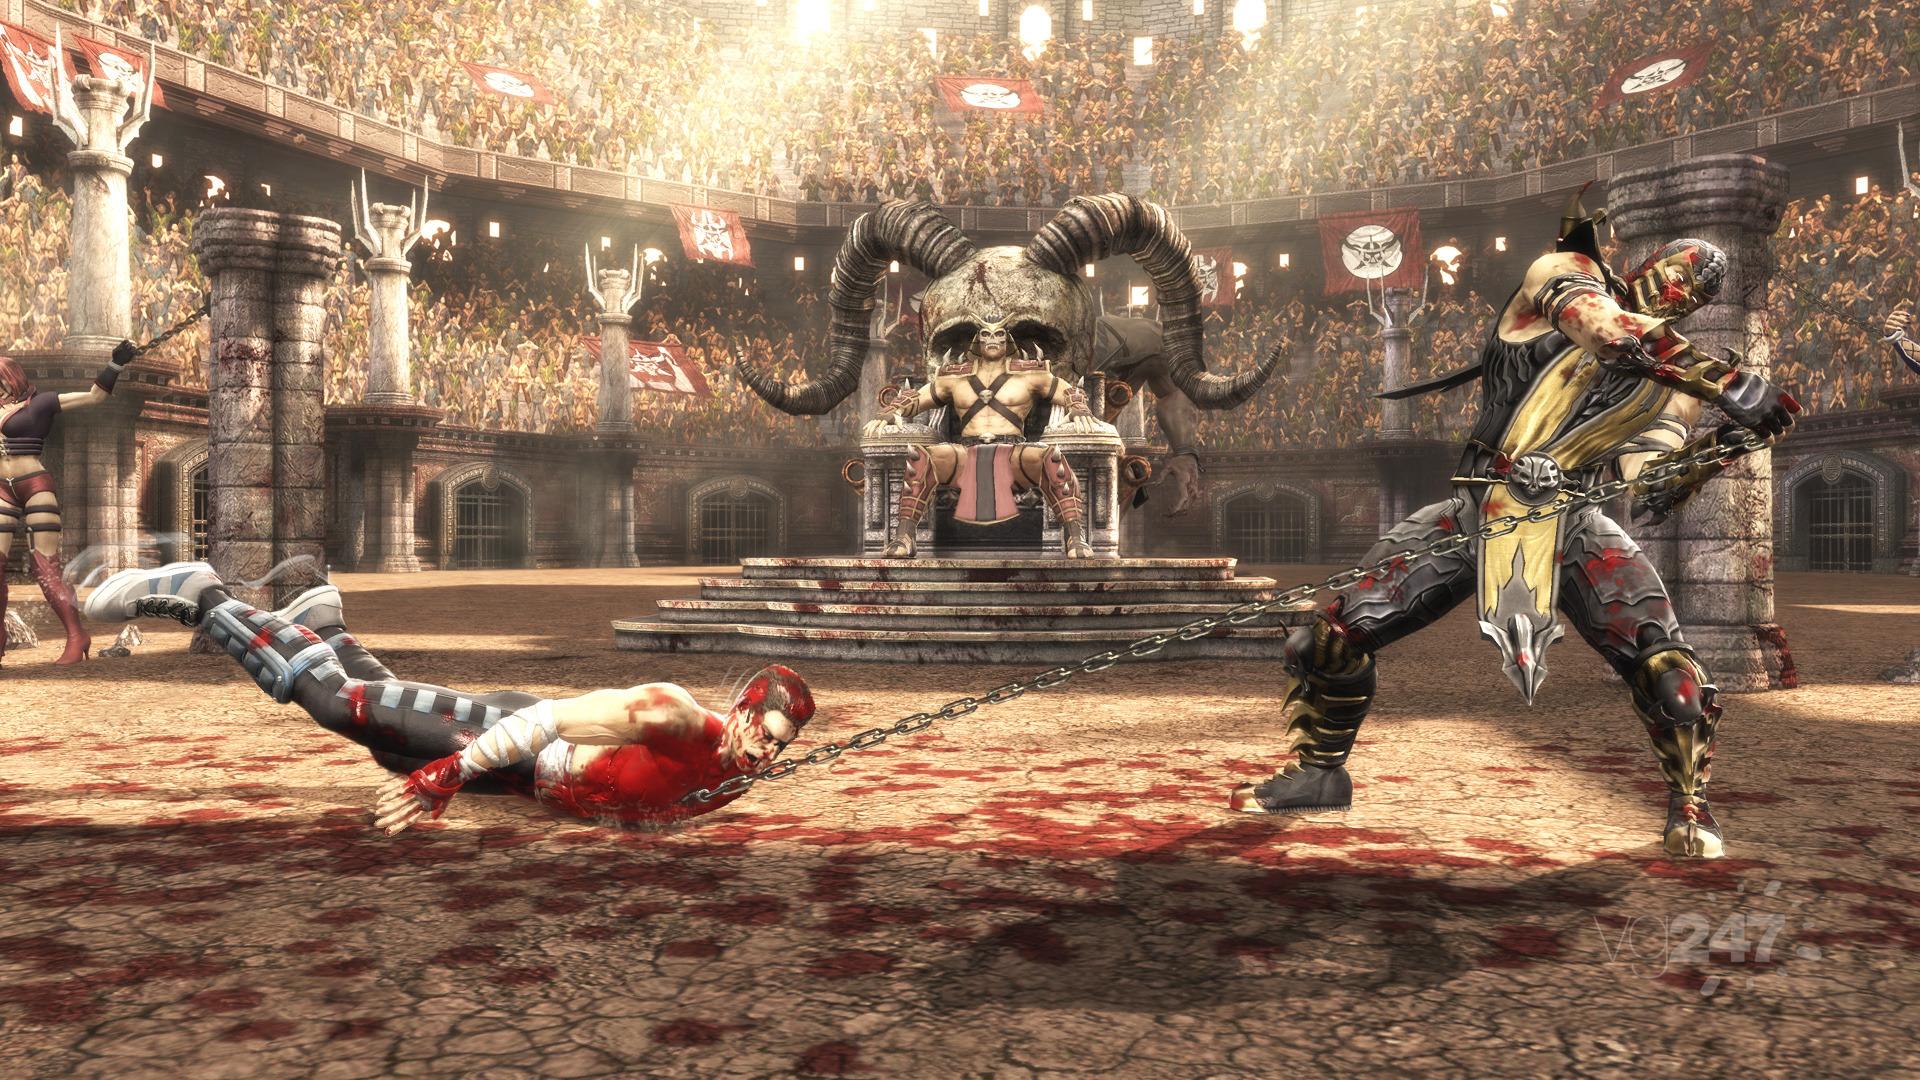 Mortal Kombat screens show Johnny Cage vs Sub-Zero, Scorpion